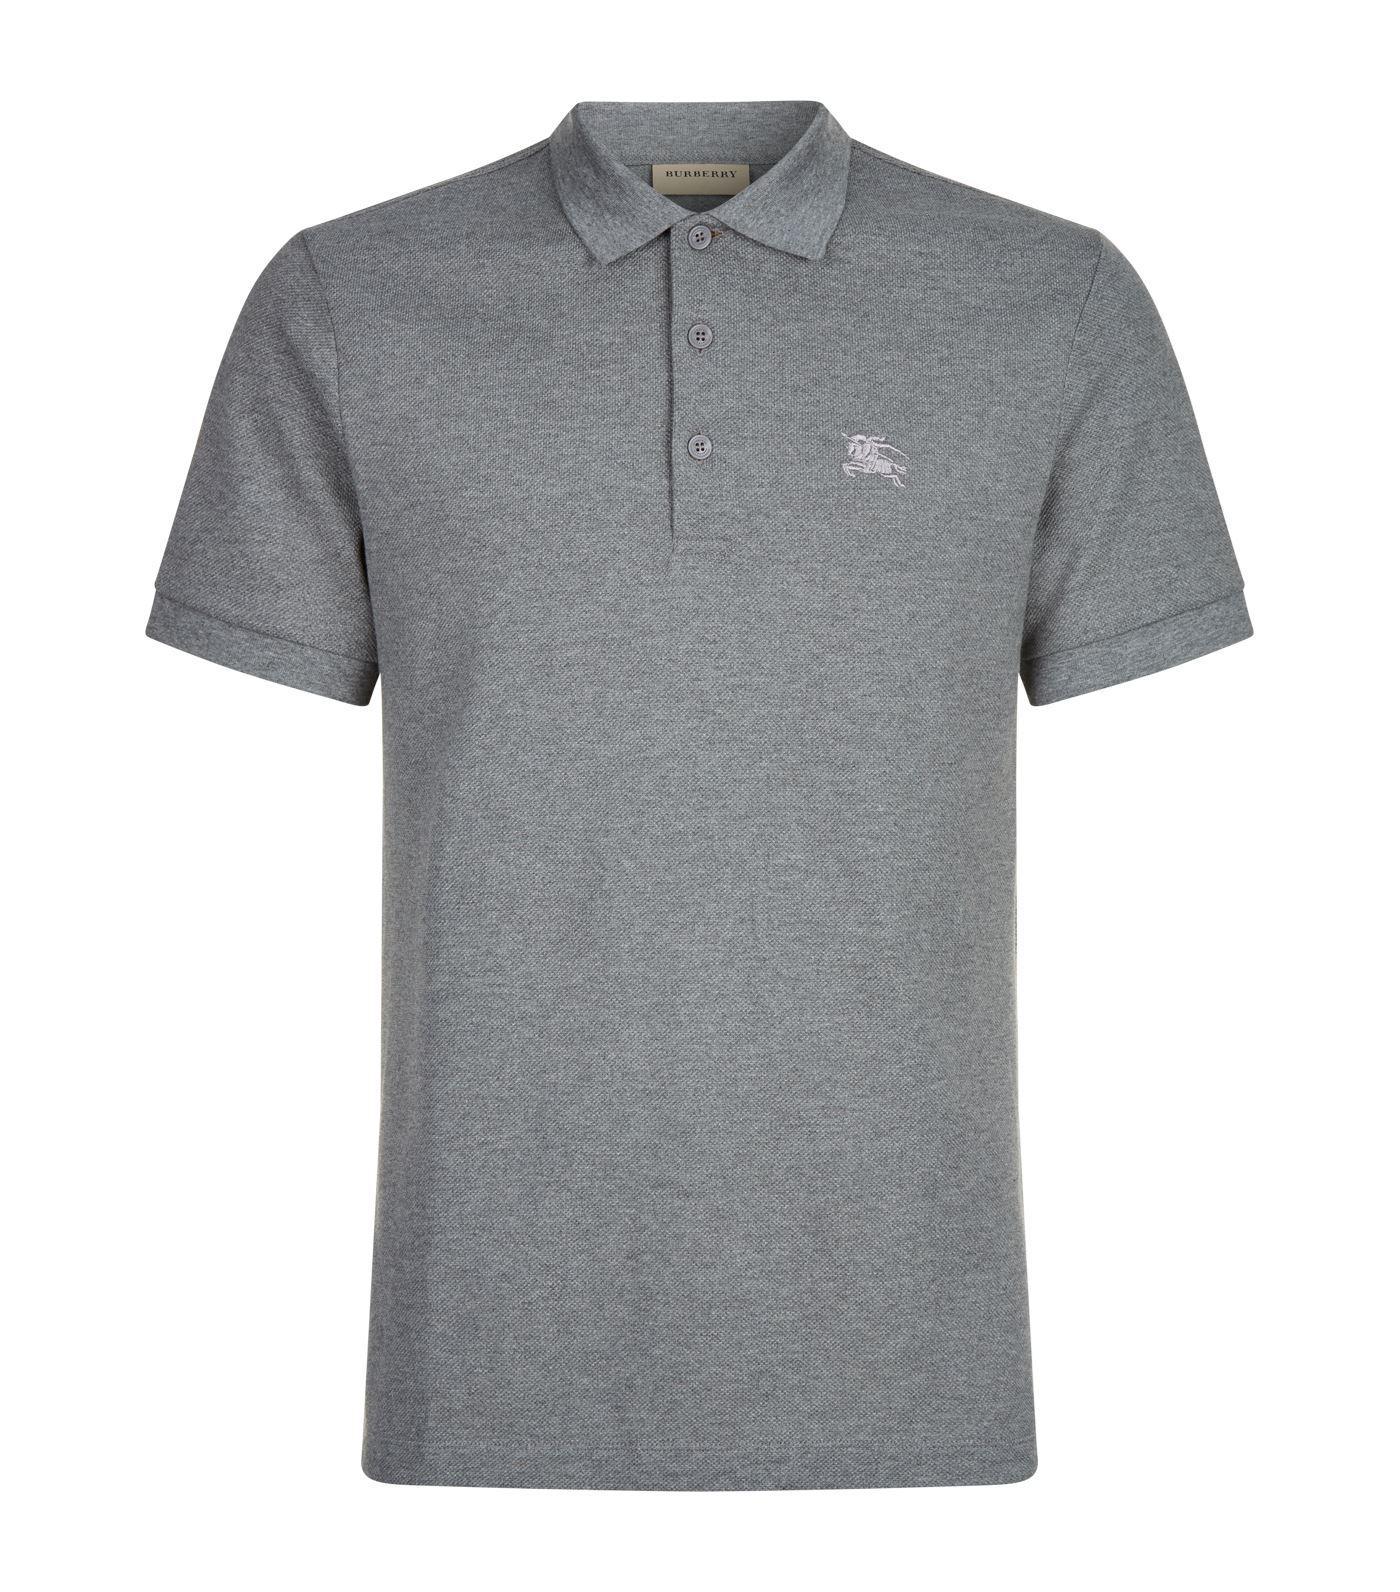 c9d5f2e4 Burberry Brit Mens Black Cotton Nova Check Placket Polo Shirt – EDGE ...